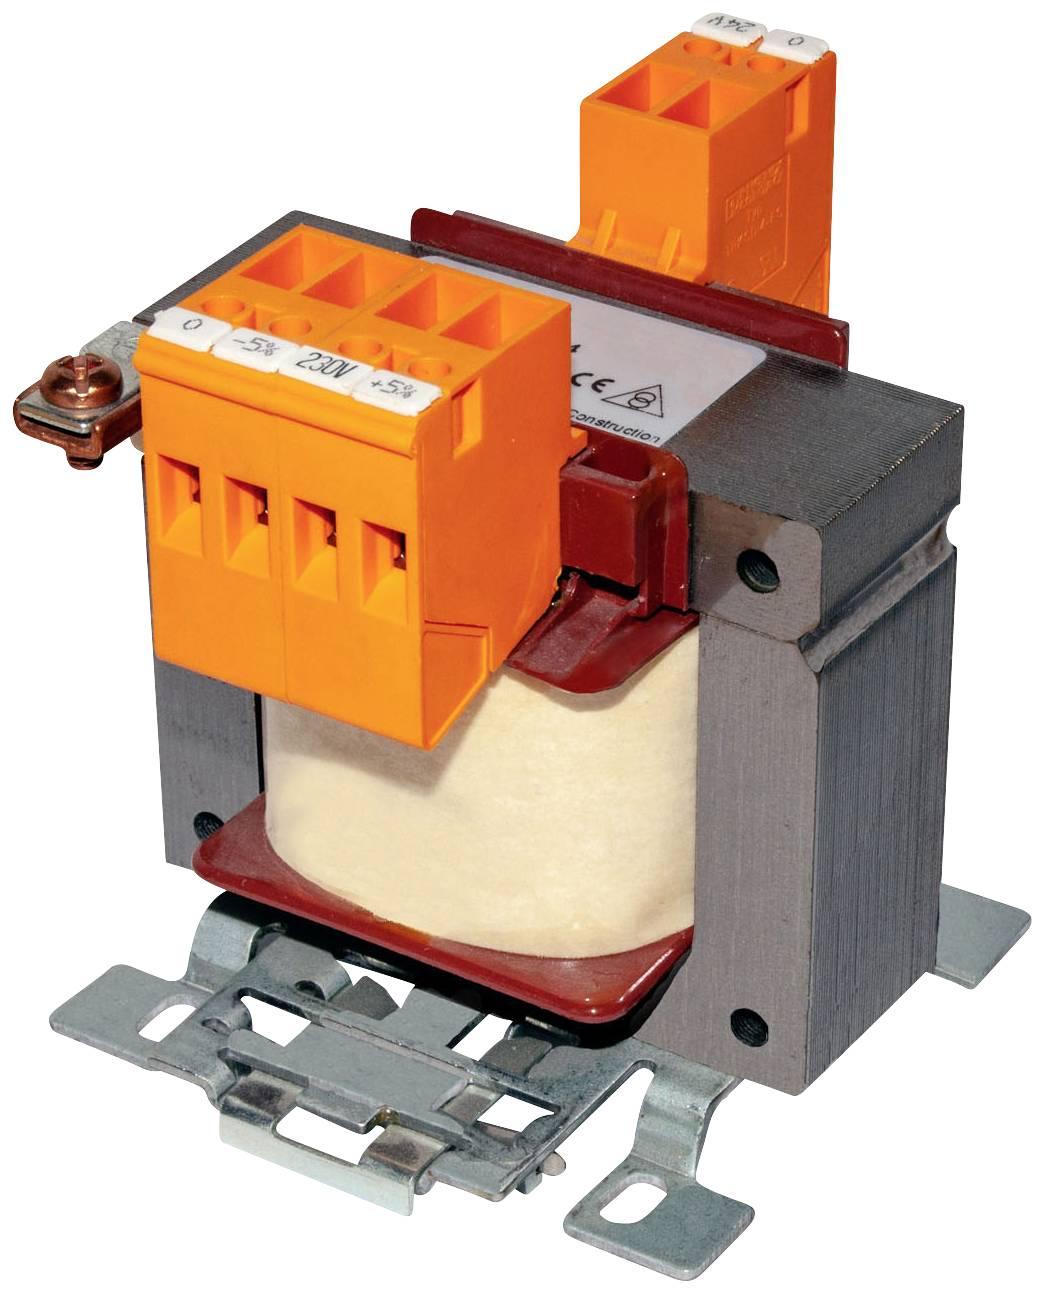 Riadiaci transformátor Weiss Elektrotechnik WUSTTR 100/21230, 100 VA